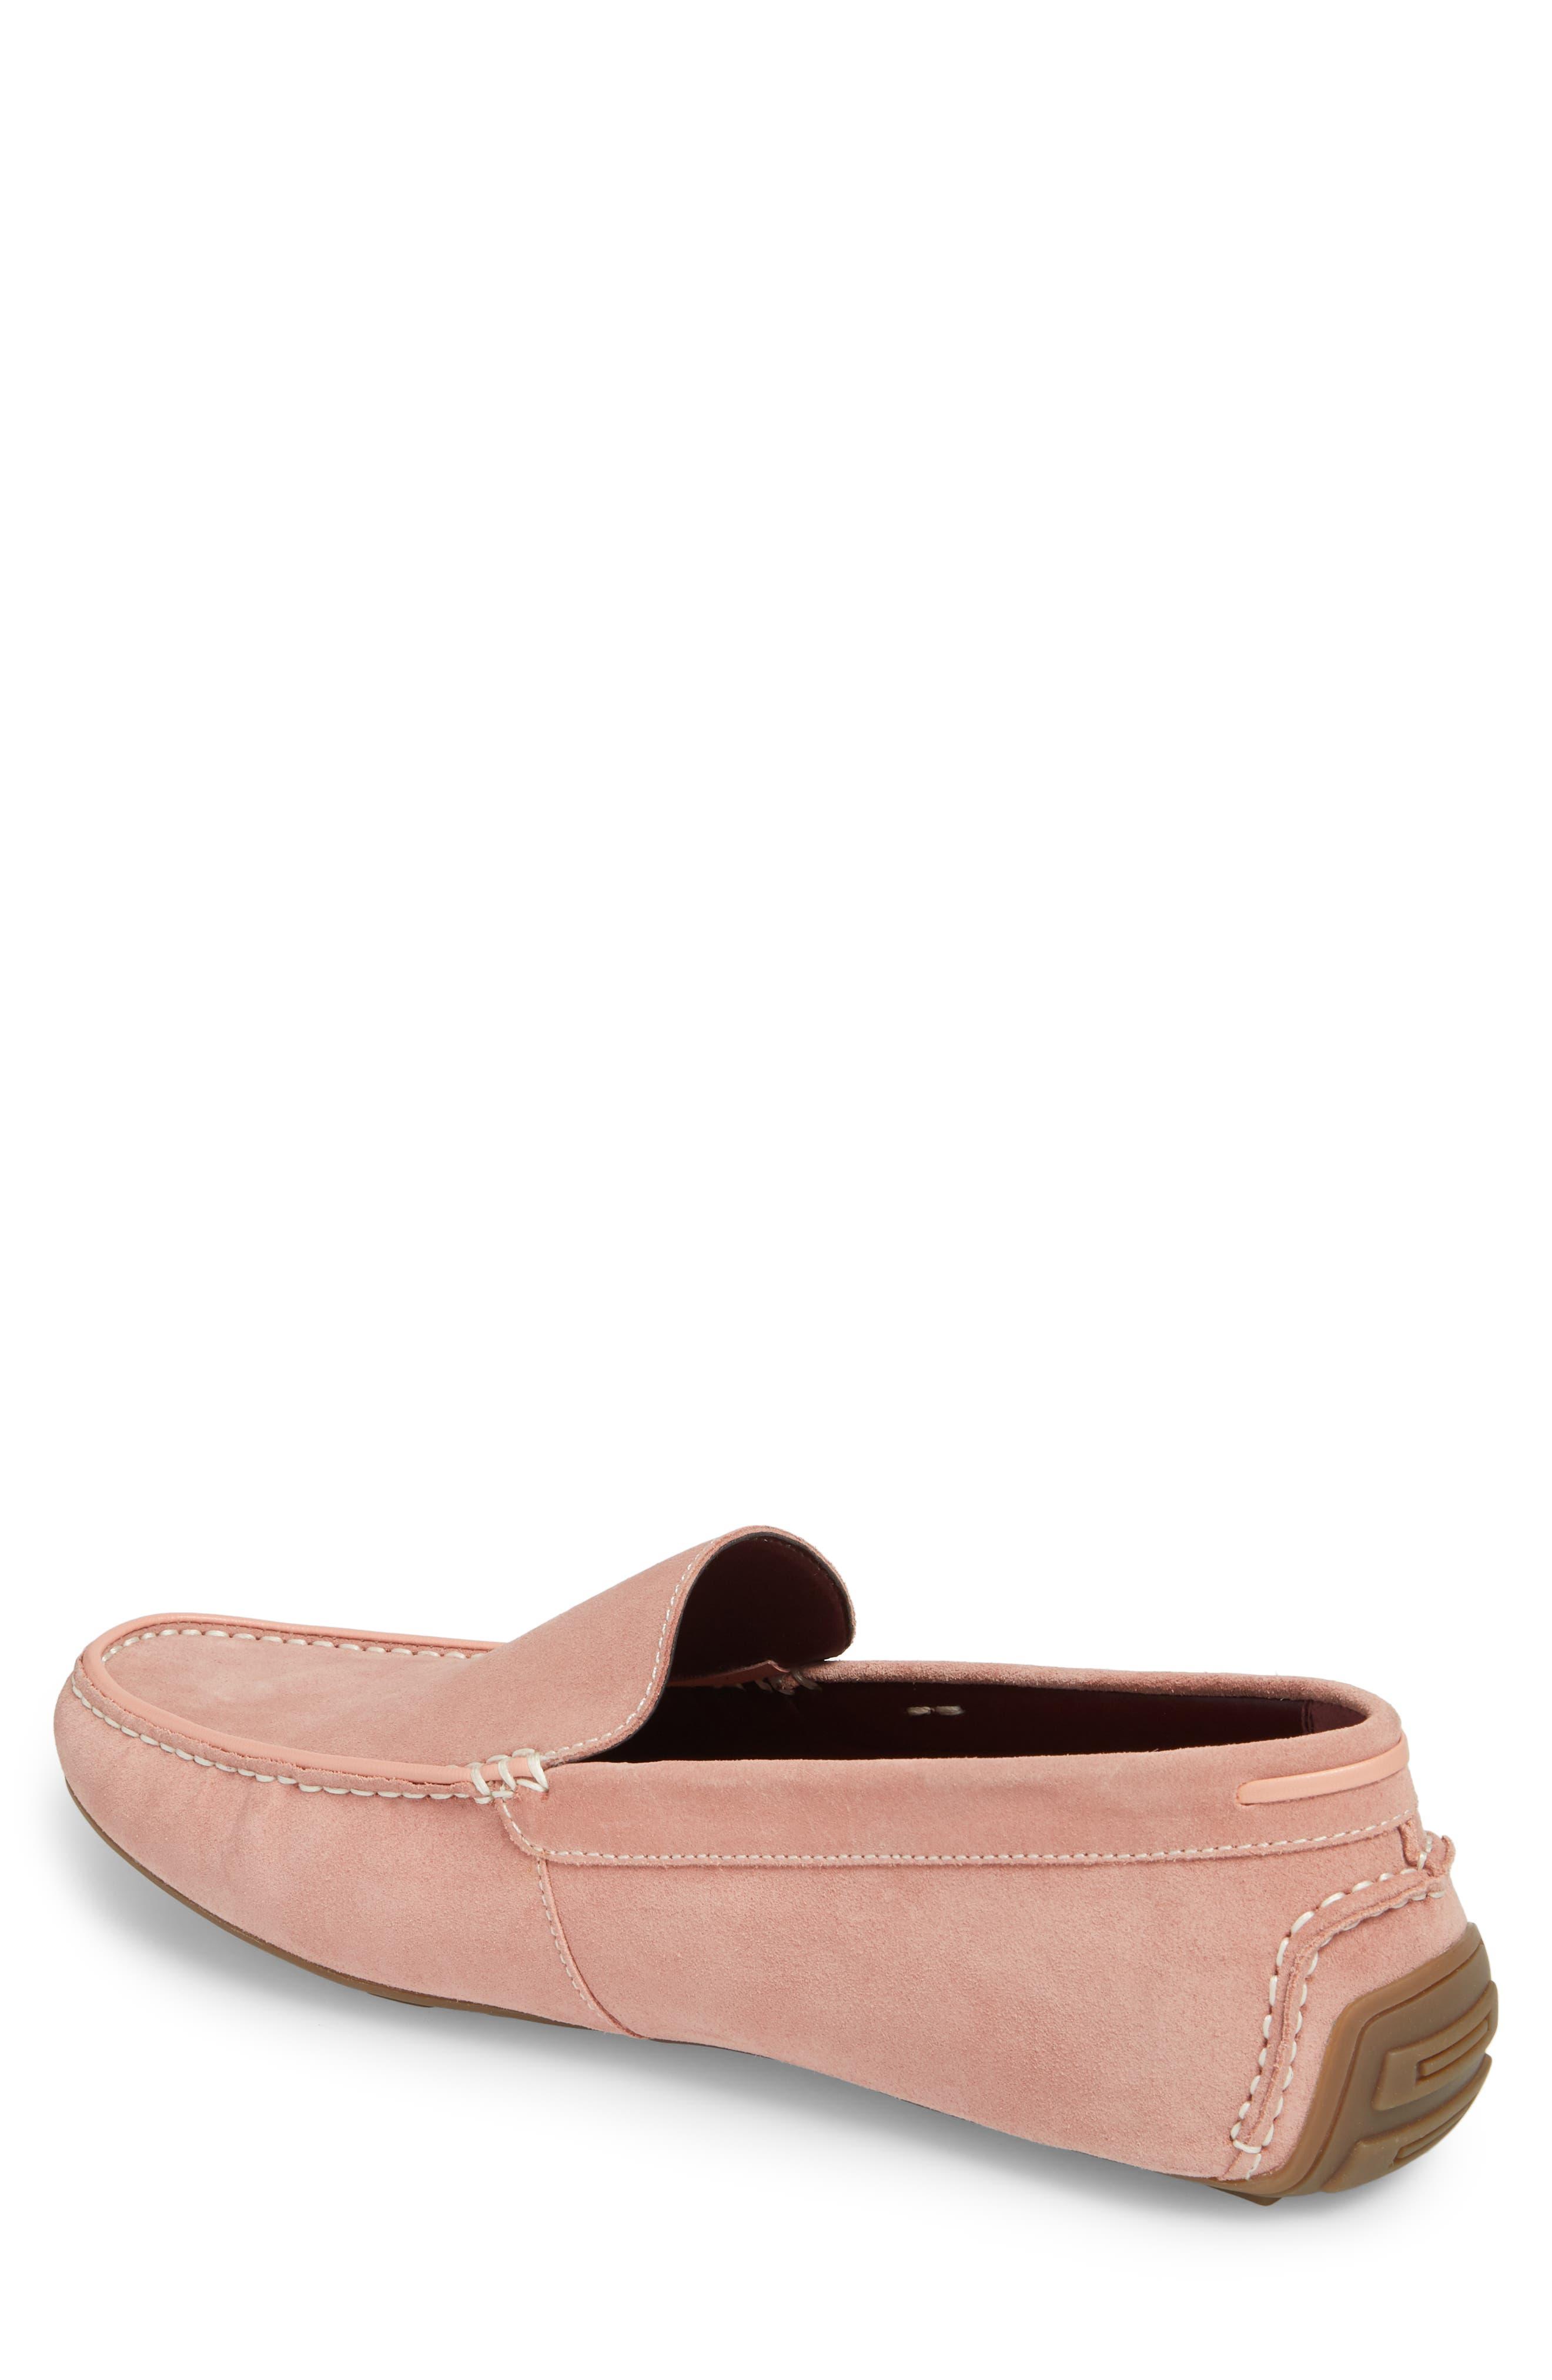 Leroy Driver Shoe,                             Alternate thumbnail 2, color,                             Blush